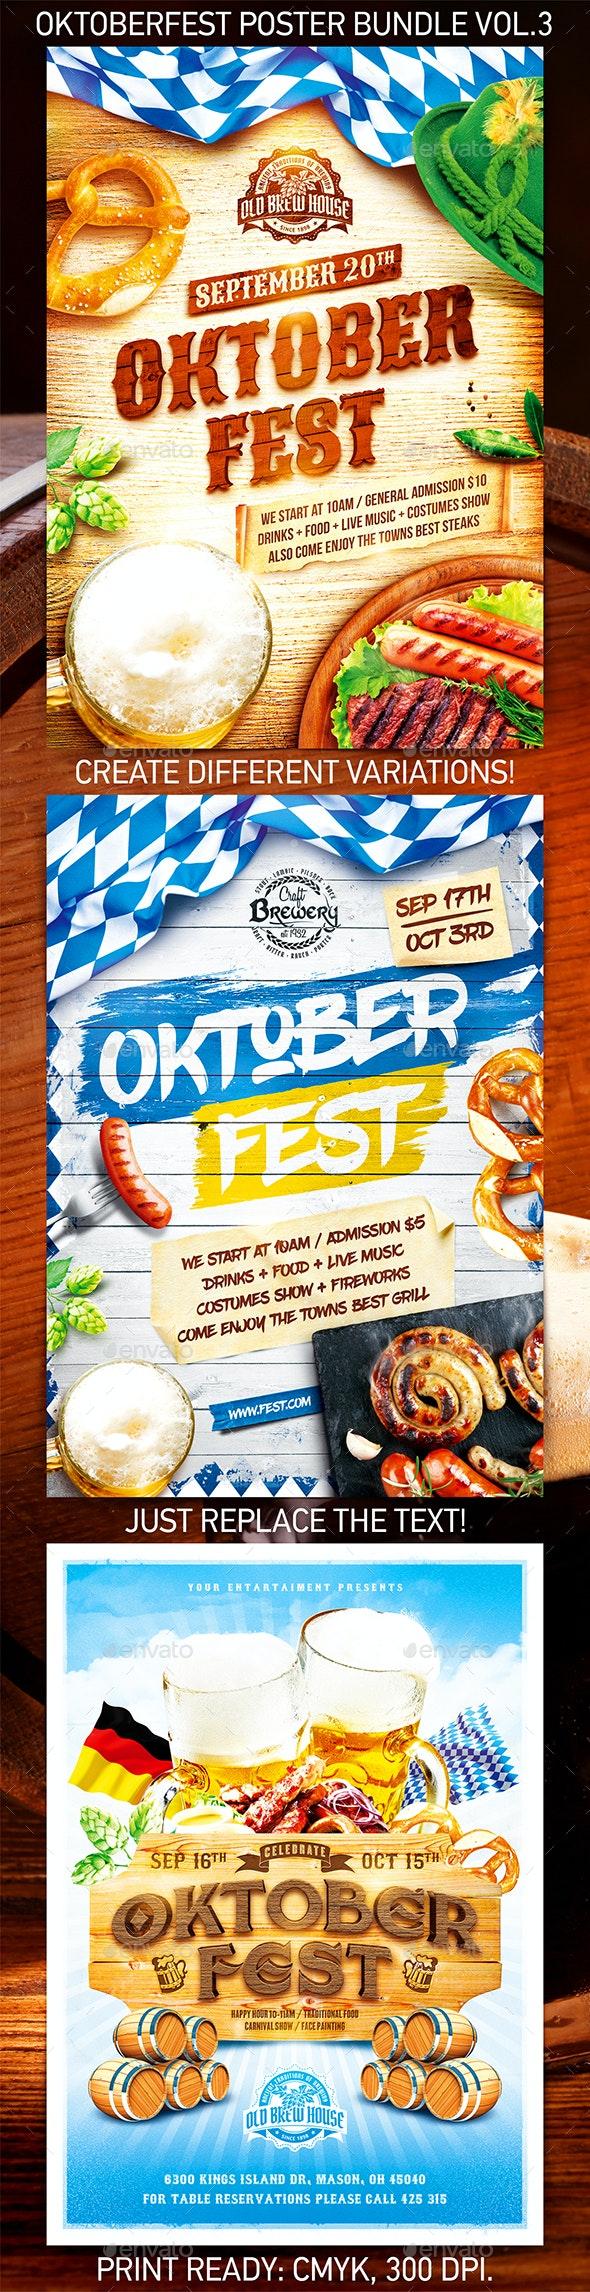 Oktoberfest Festival Poster Bundle vol.3 - Holidays Events